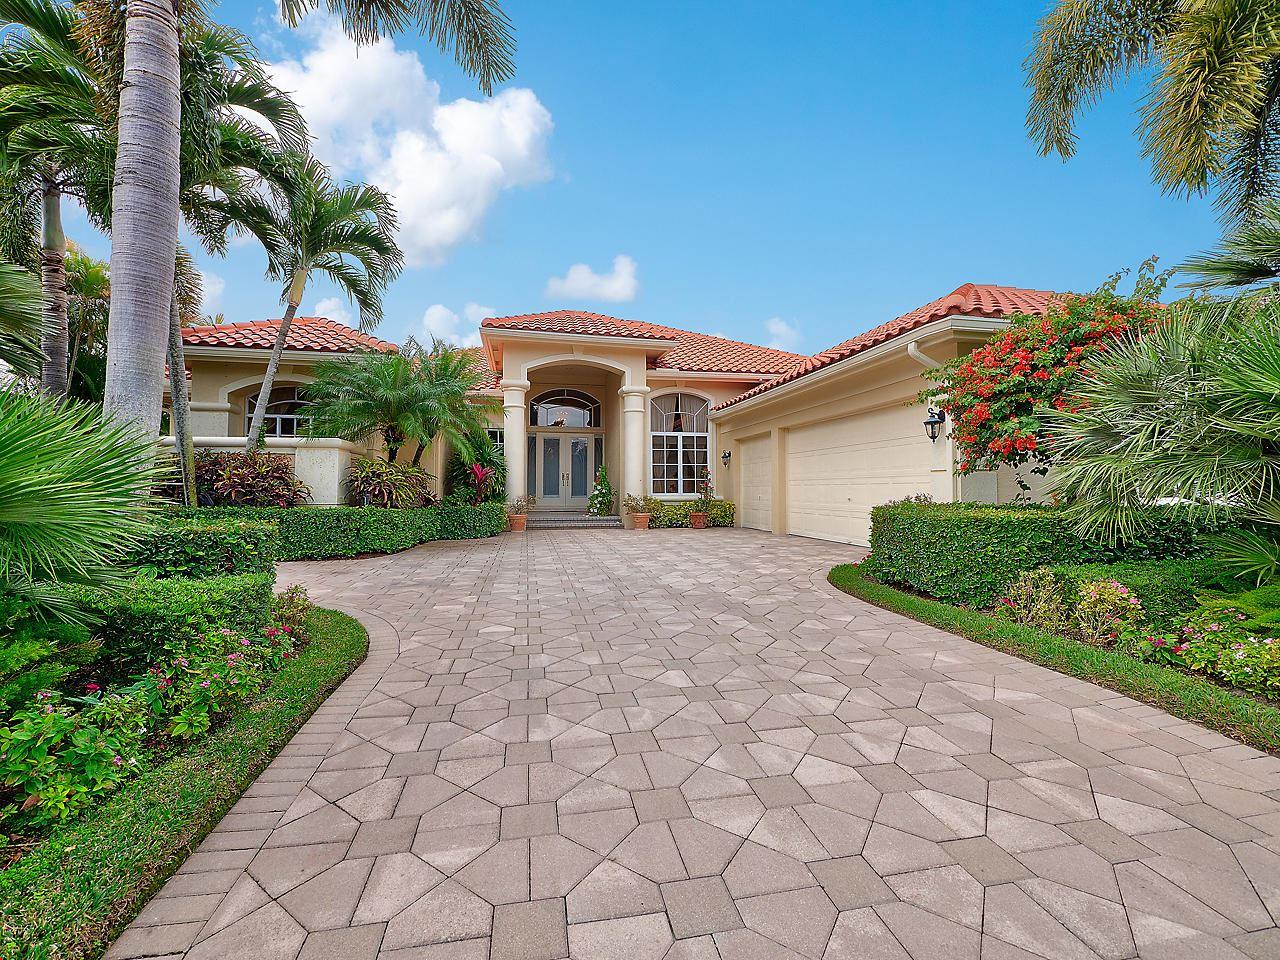 Photo of 1002 Grand Isle Way, Palm Beach Gardens, FL 33418 (MLS # RX-10687533)